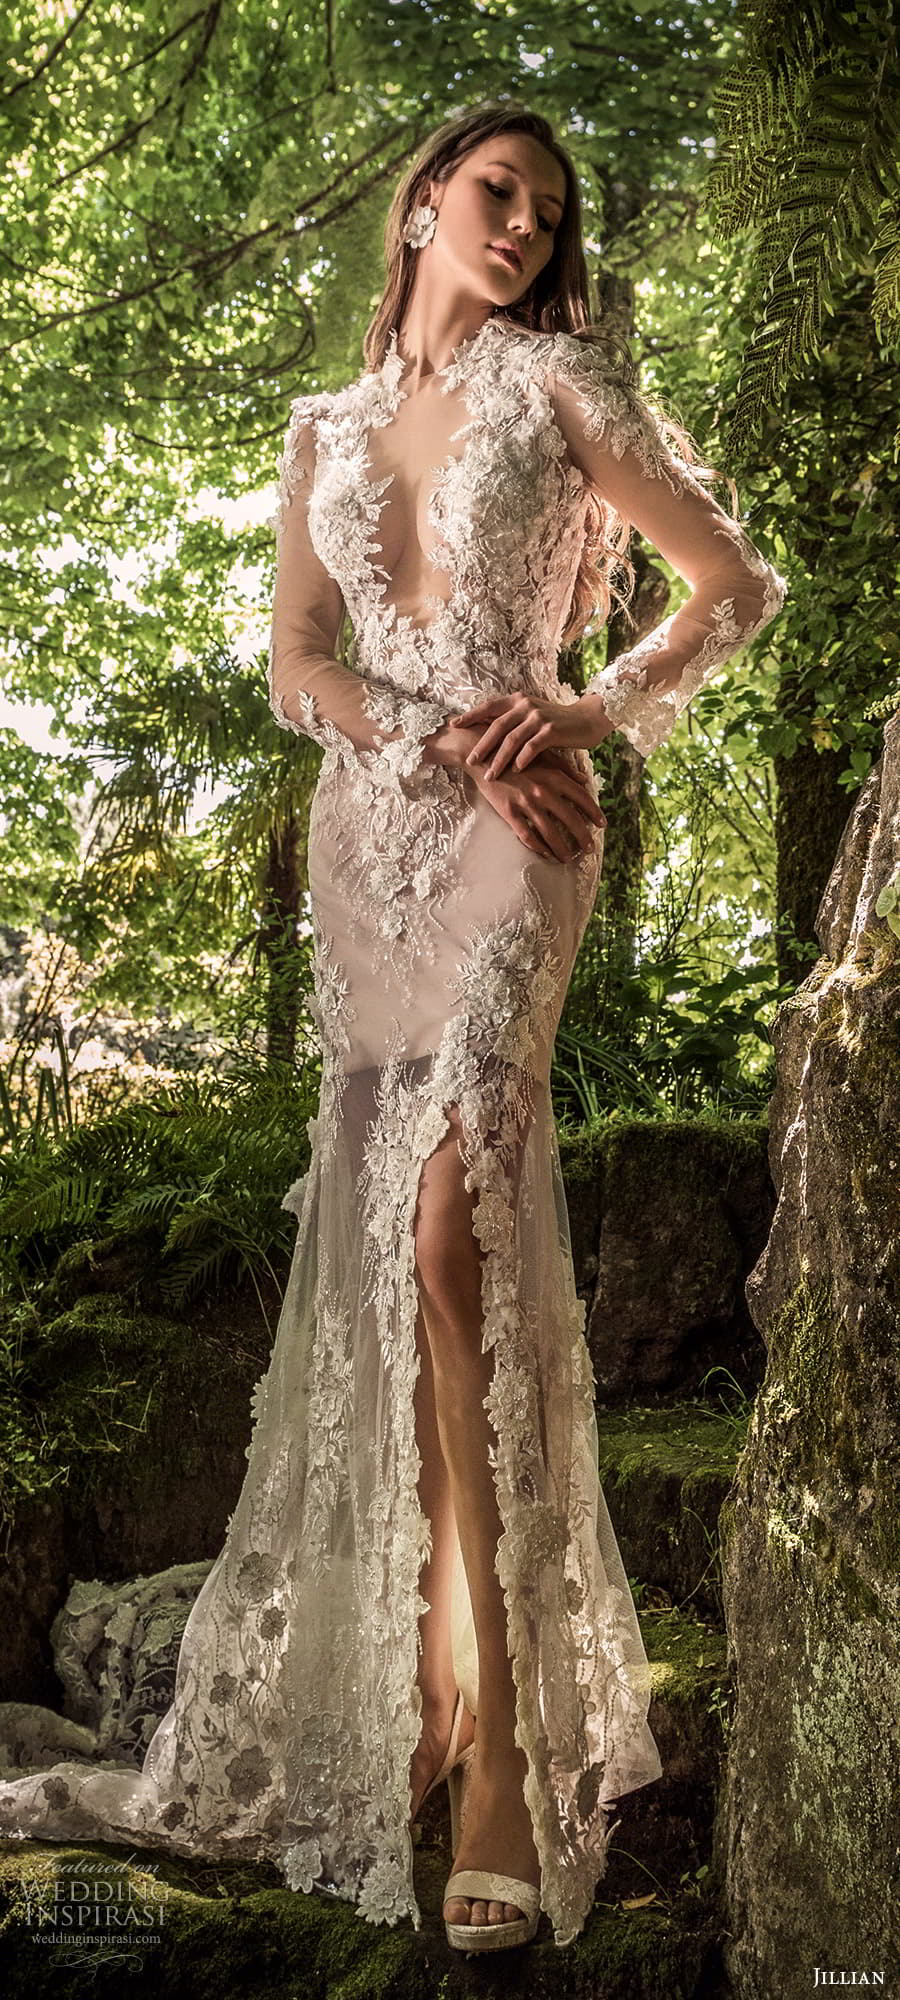 jillian 2022 bridal sheer long sleeve plunging v neckline fully embellished sheath wedding dress chapel train (19) mv